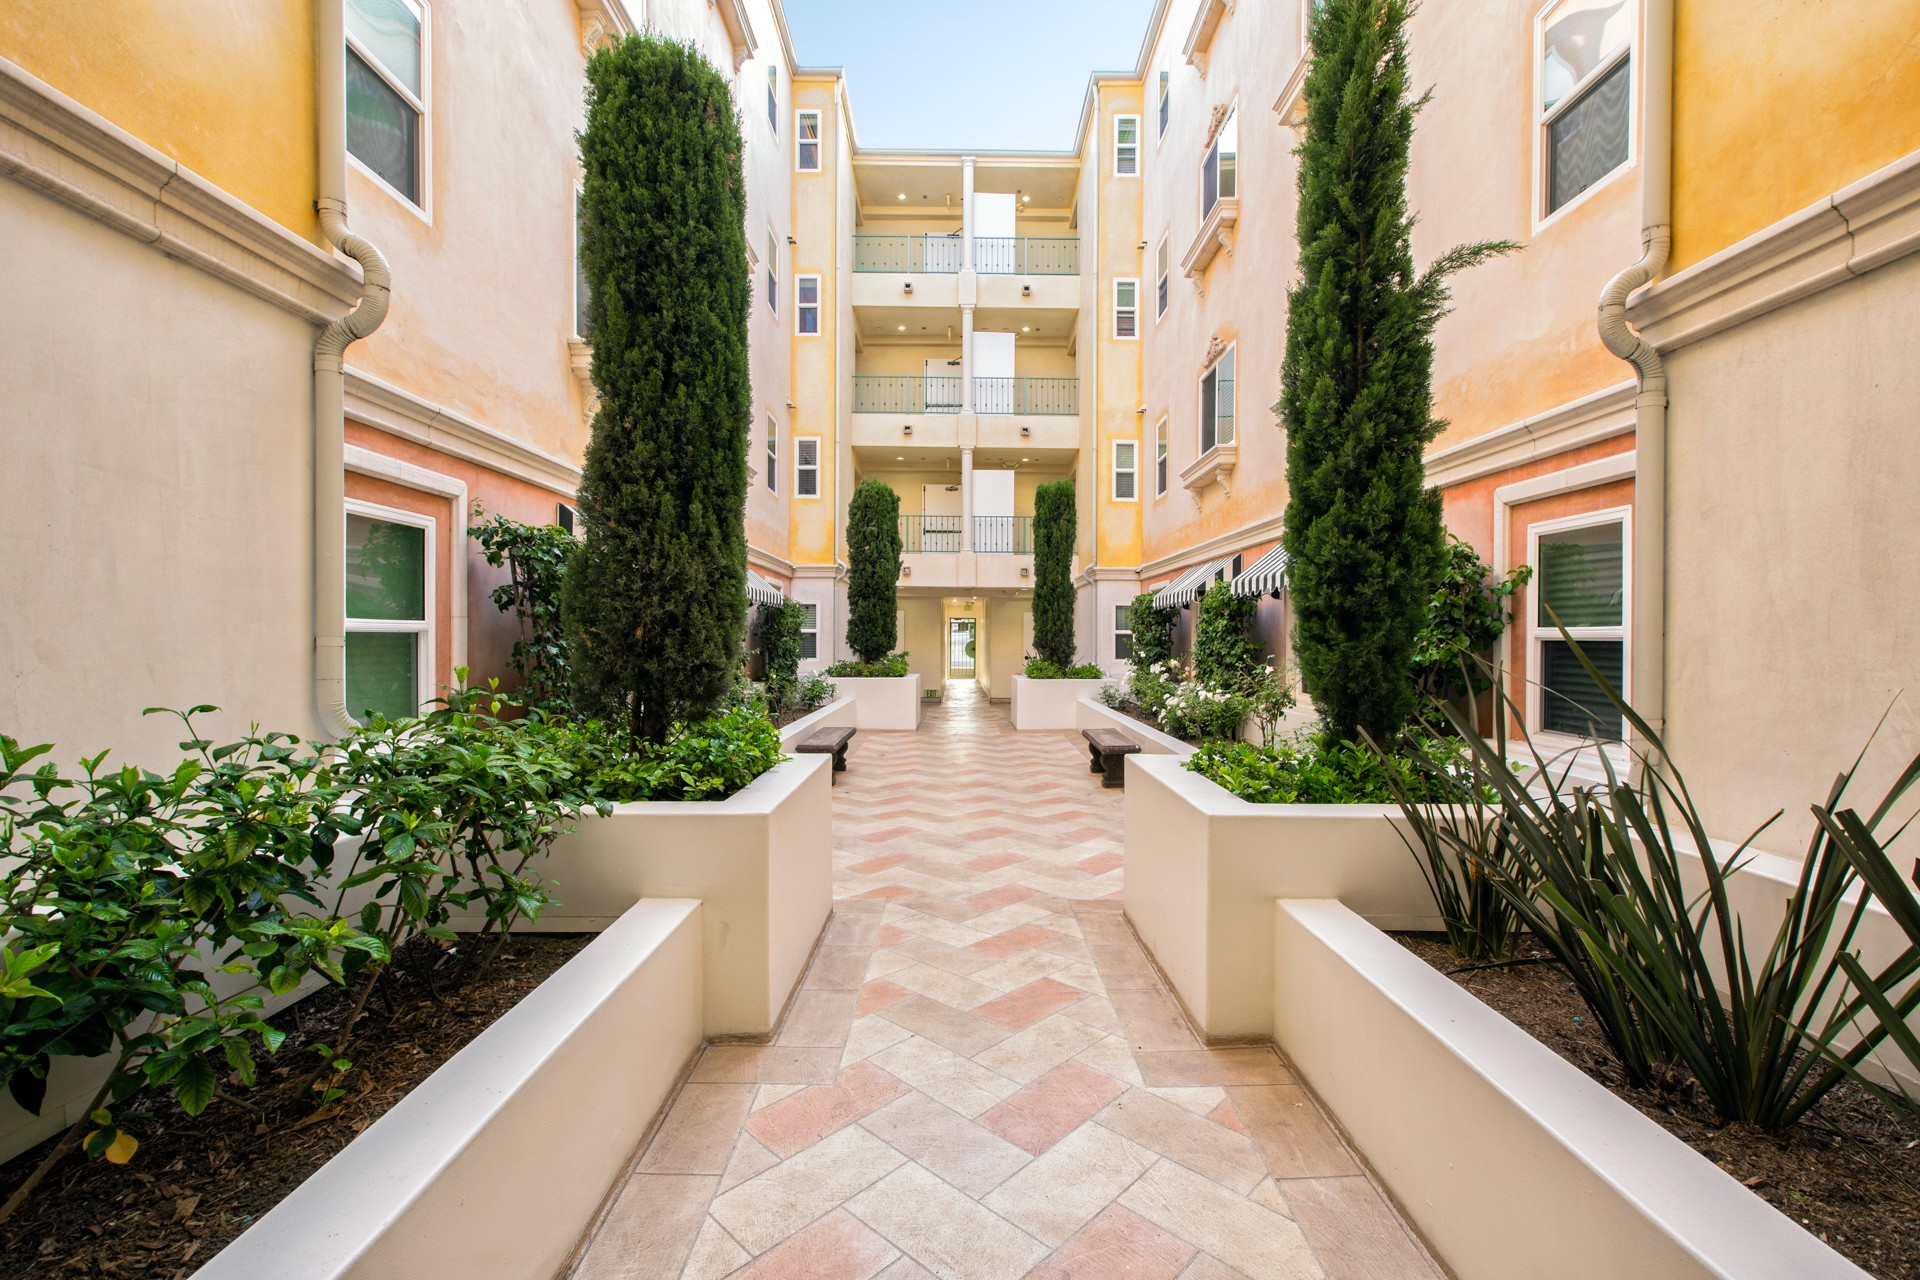 allegro apartments for rent w magnolia blvd los angeles